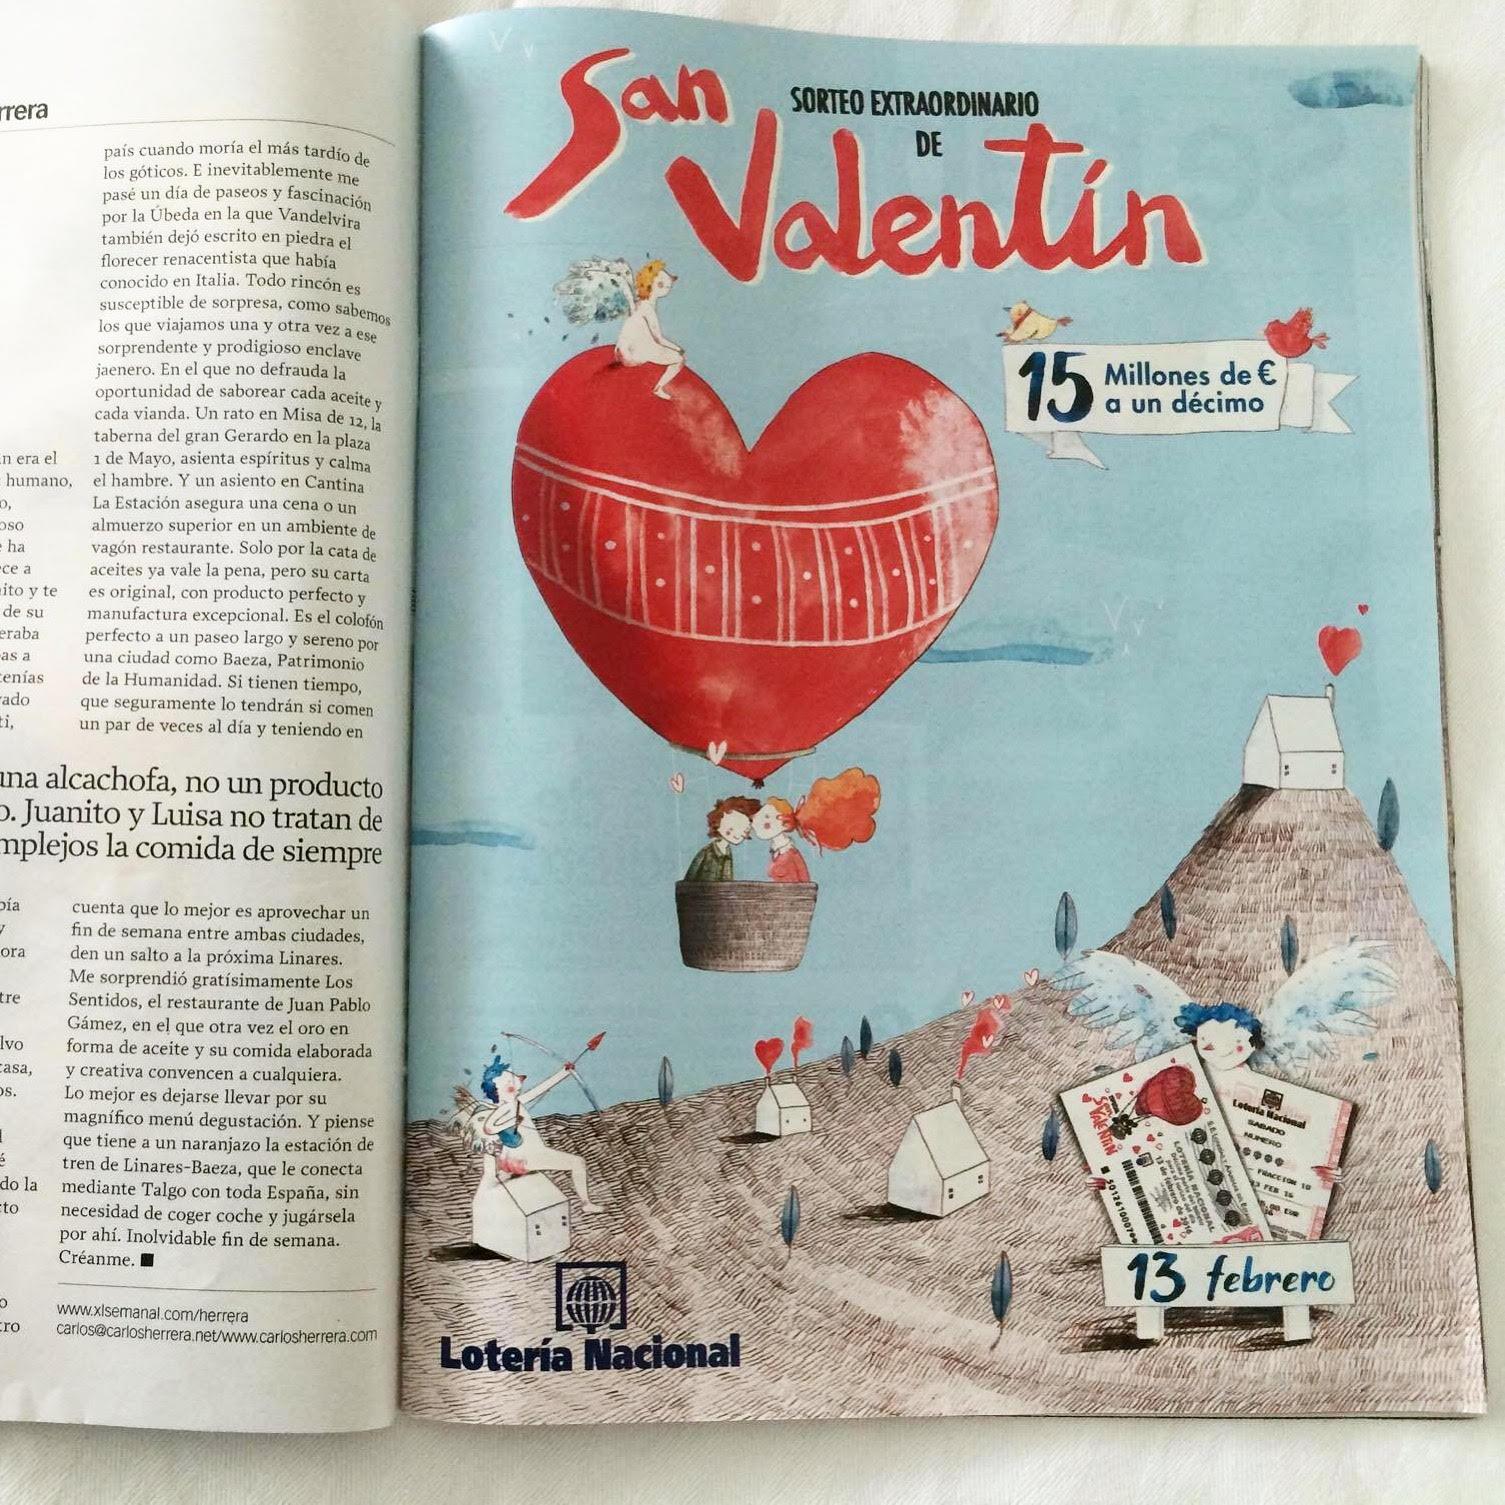 San Valentín Albert Arrayás6.jpg